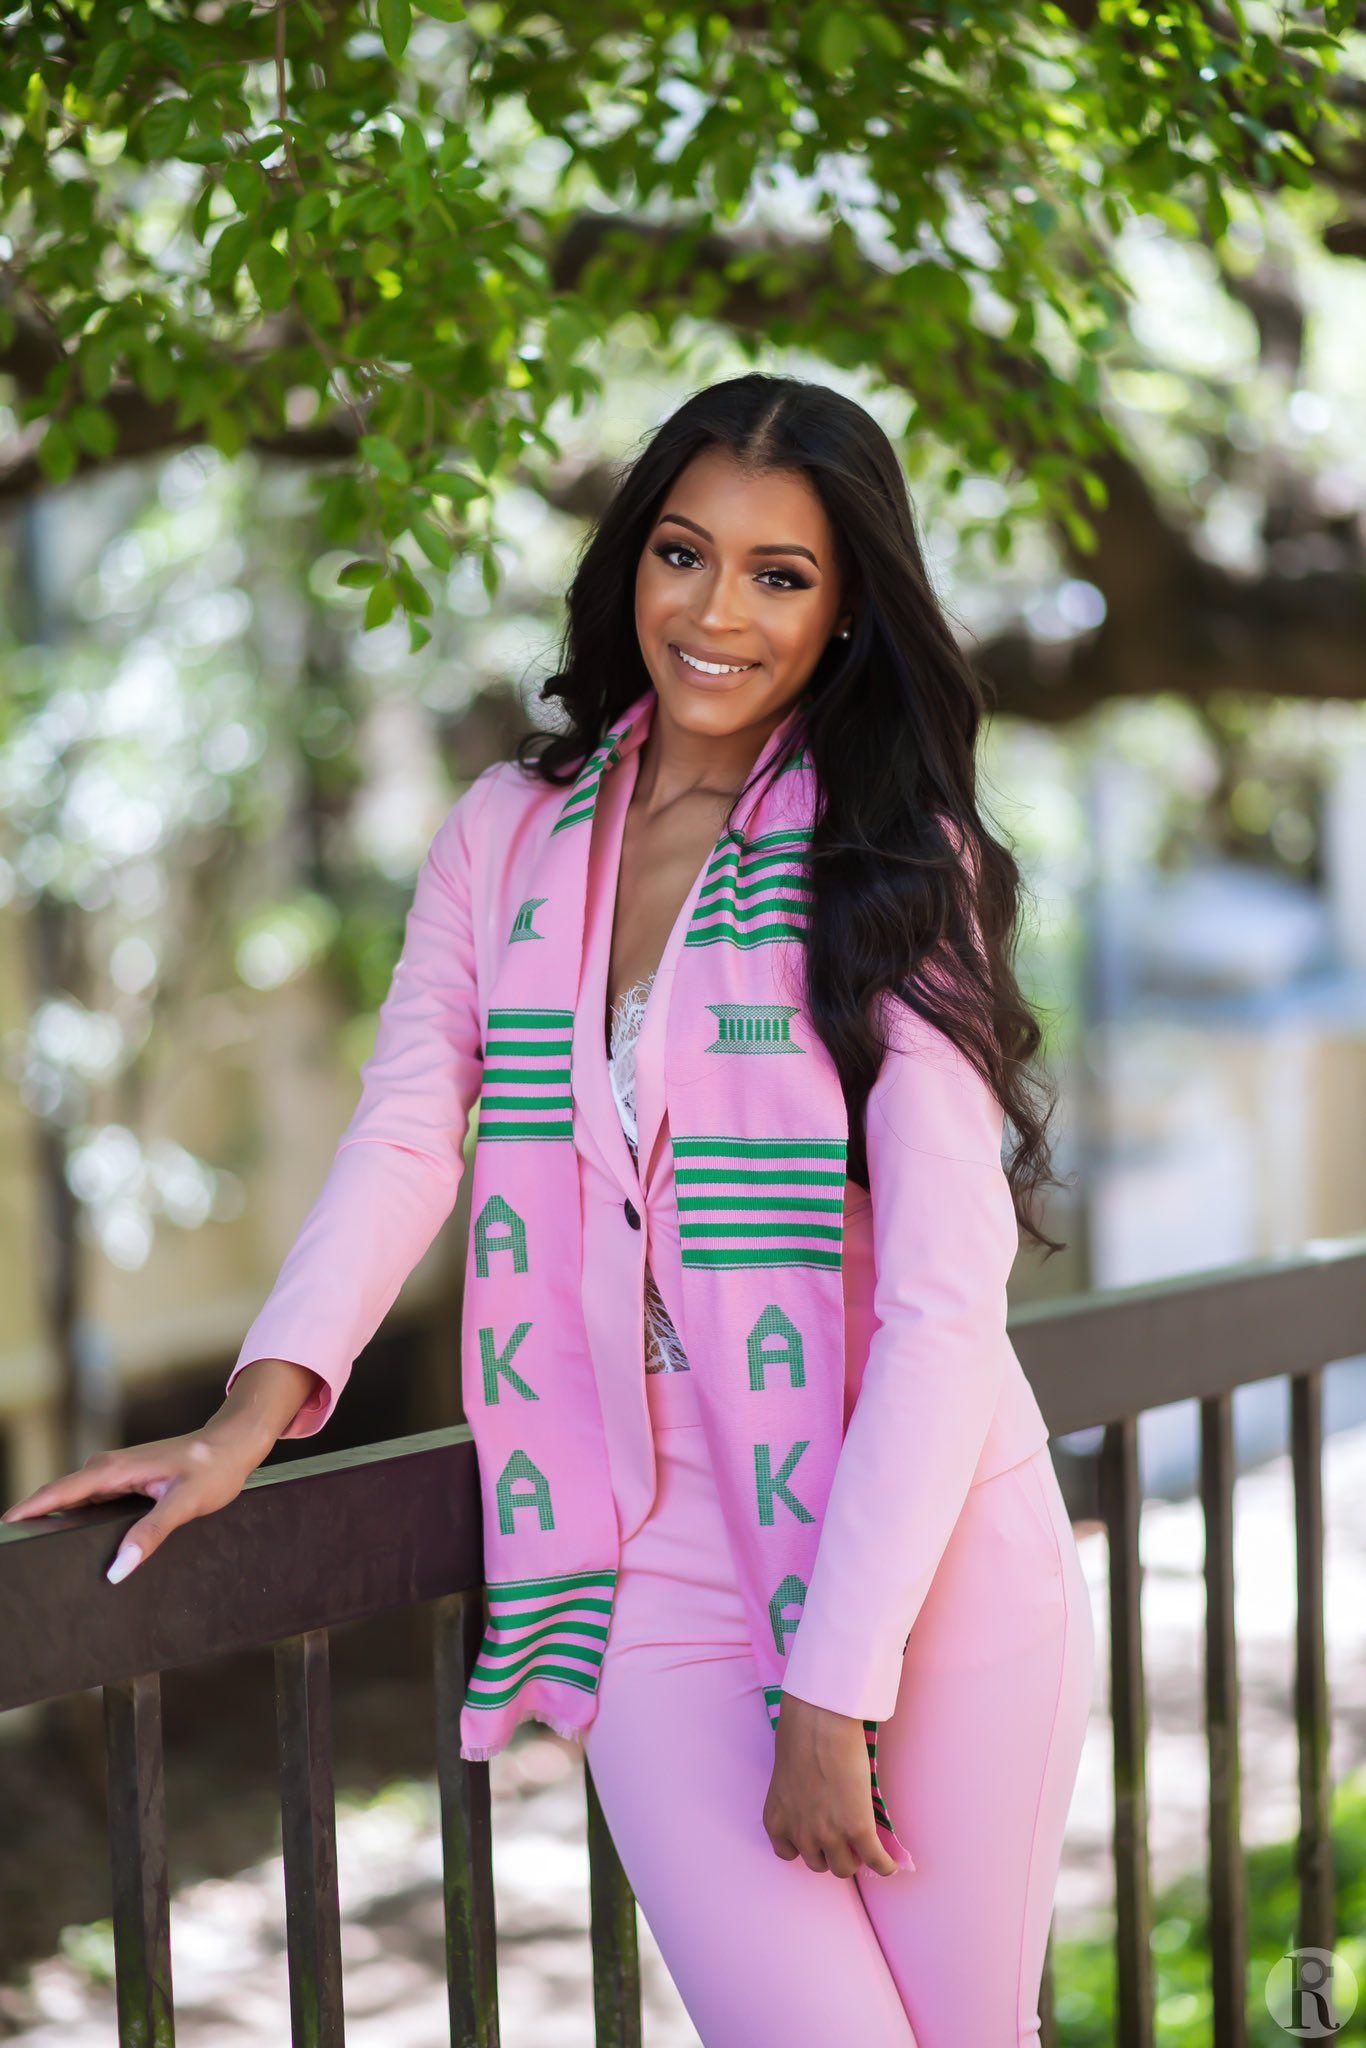 Follow allshewore girl graduation pictures moms